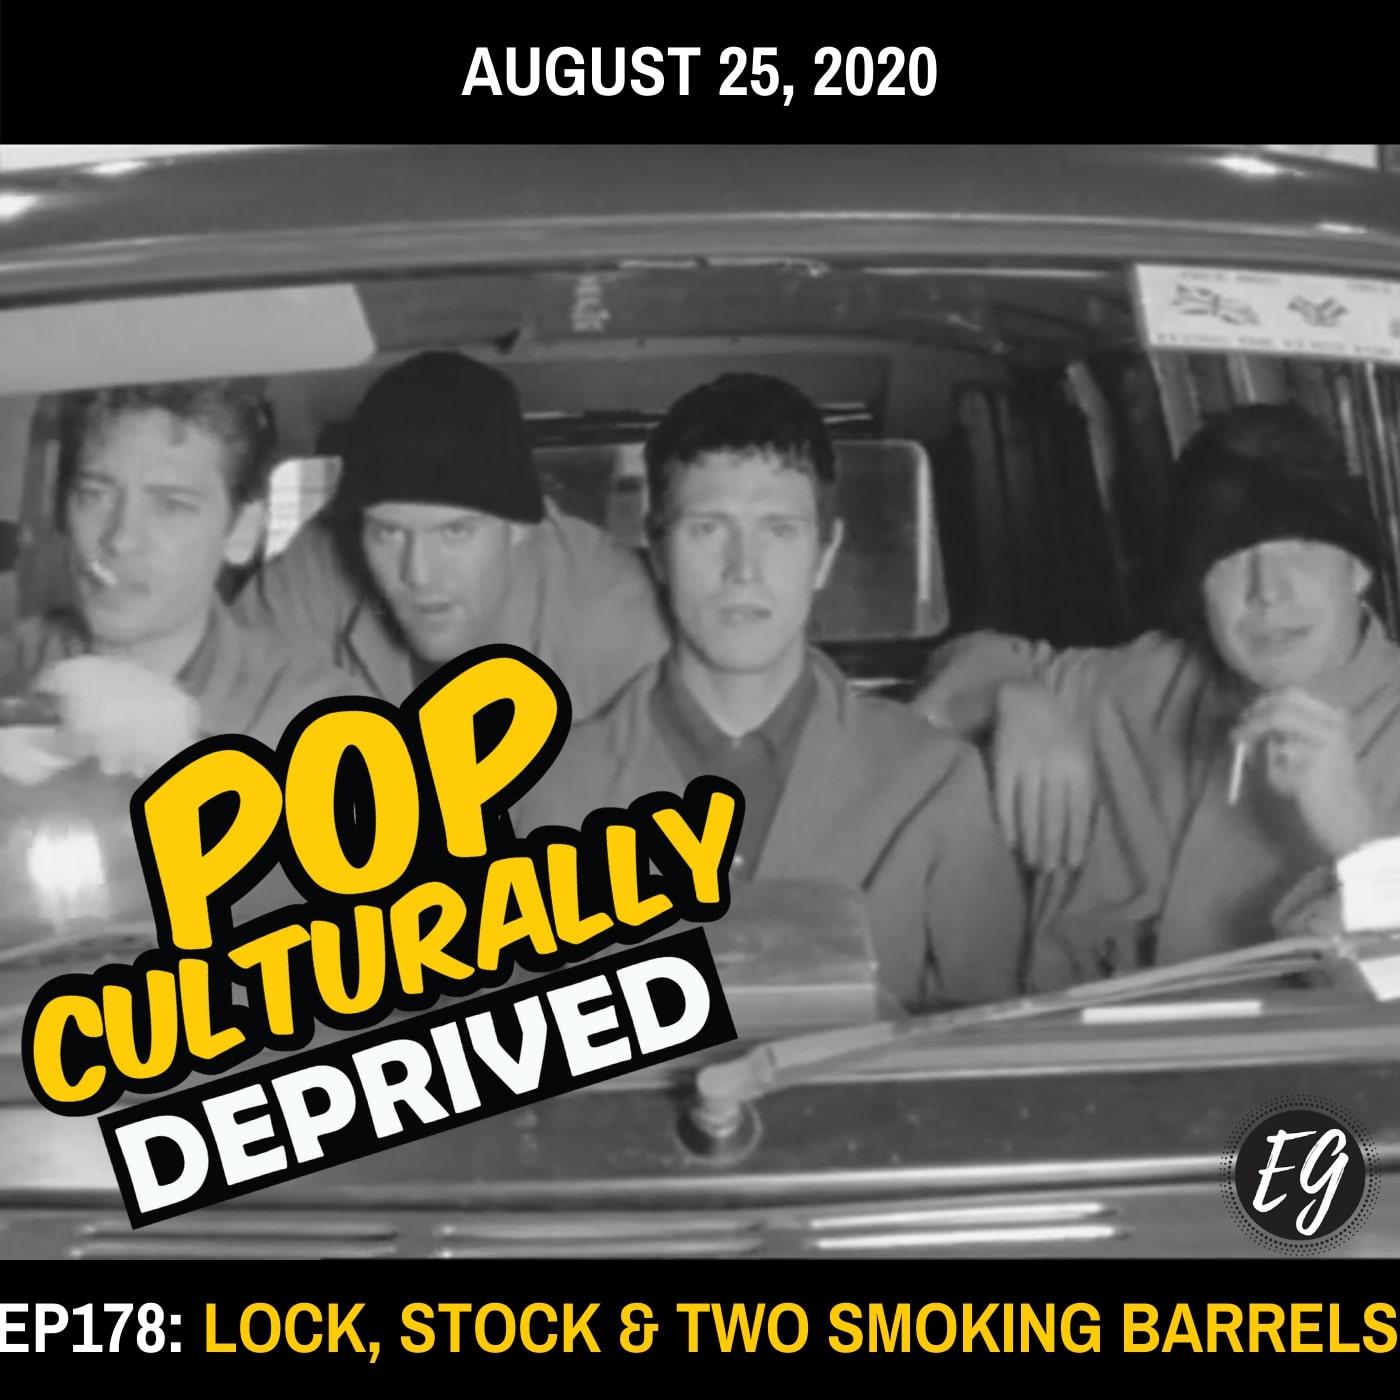 Episode 178: Lock, Stock and Two Smoking Barrels